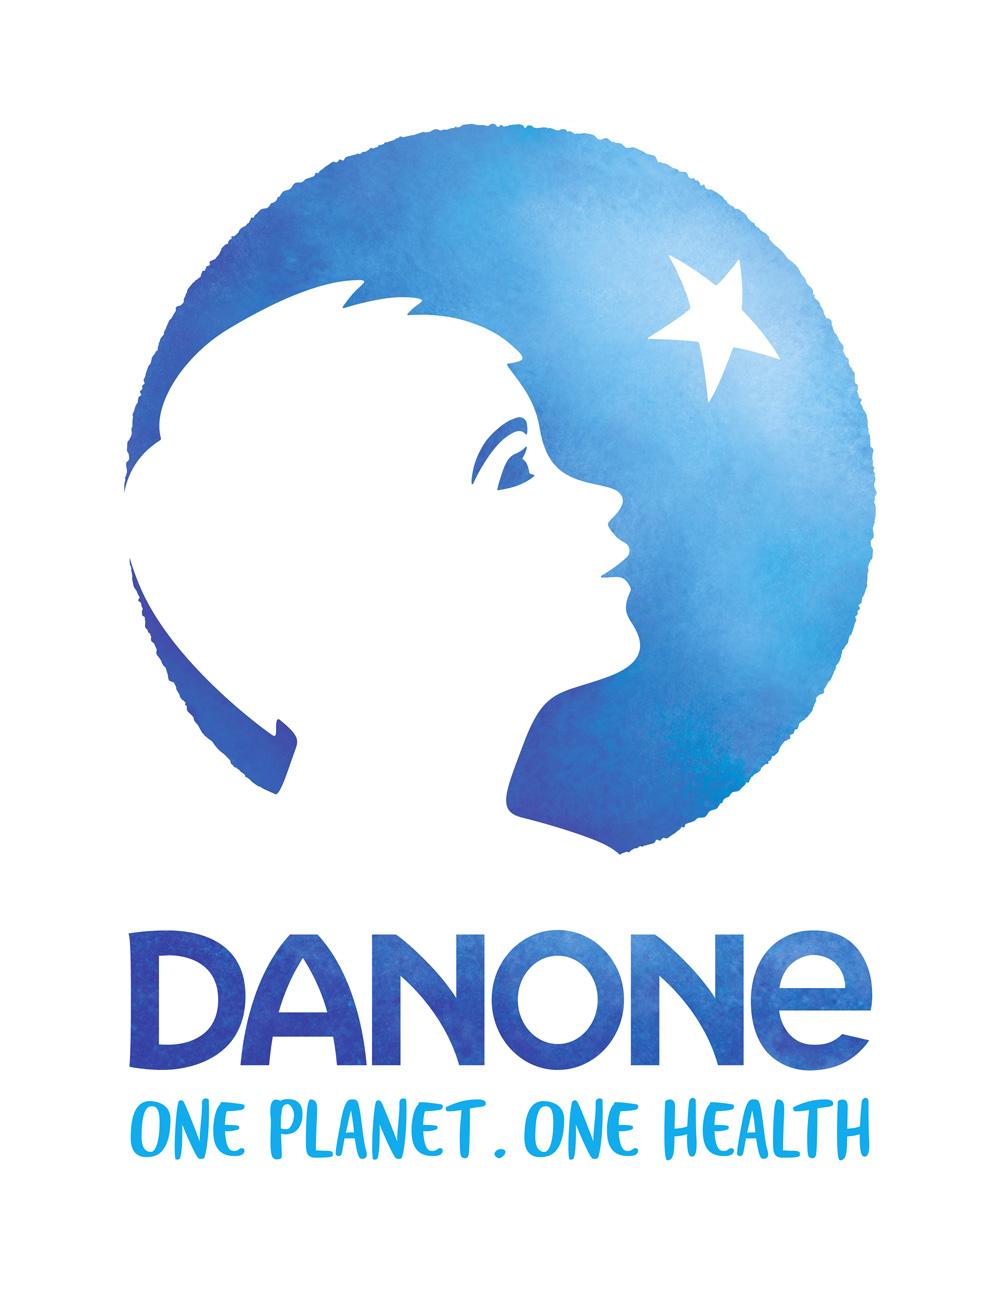 danone_2017_logo.jpg